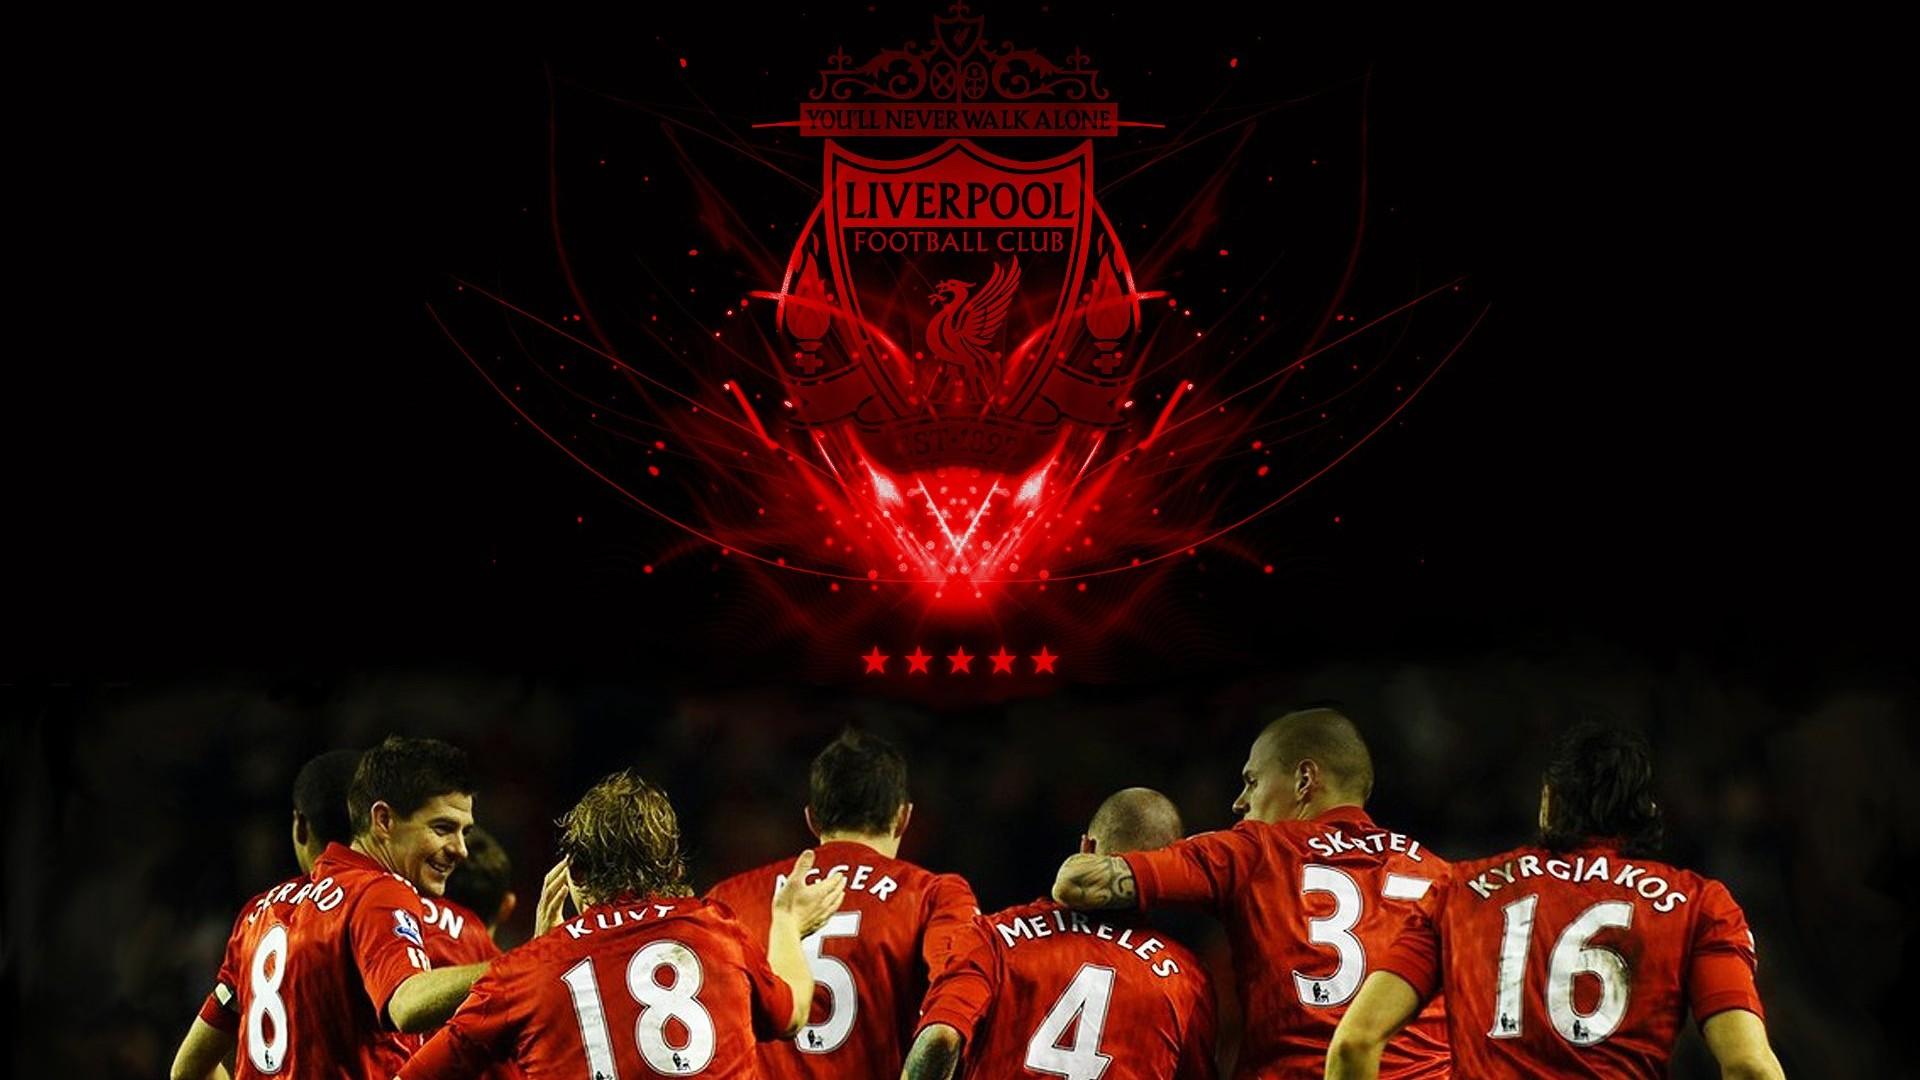 5 50654 photo wallpaper wallpaper sport logo football liverpool liverpool